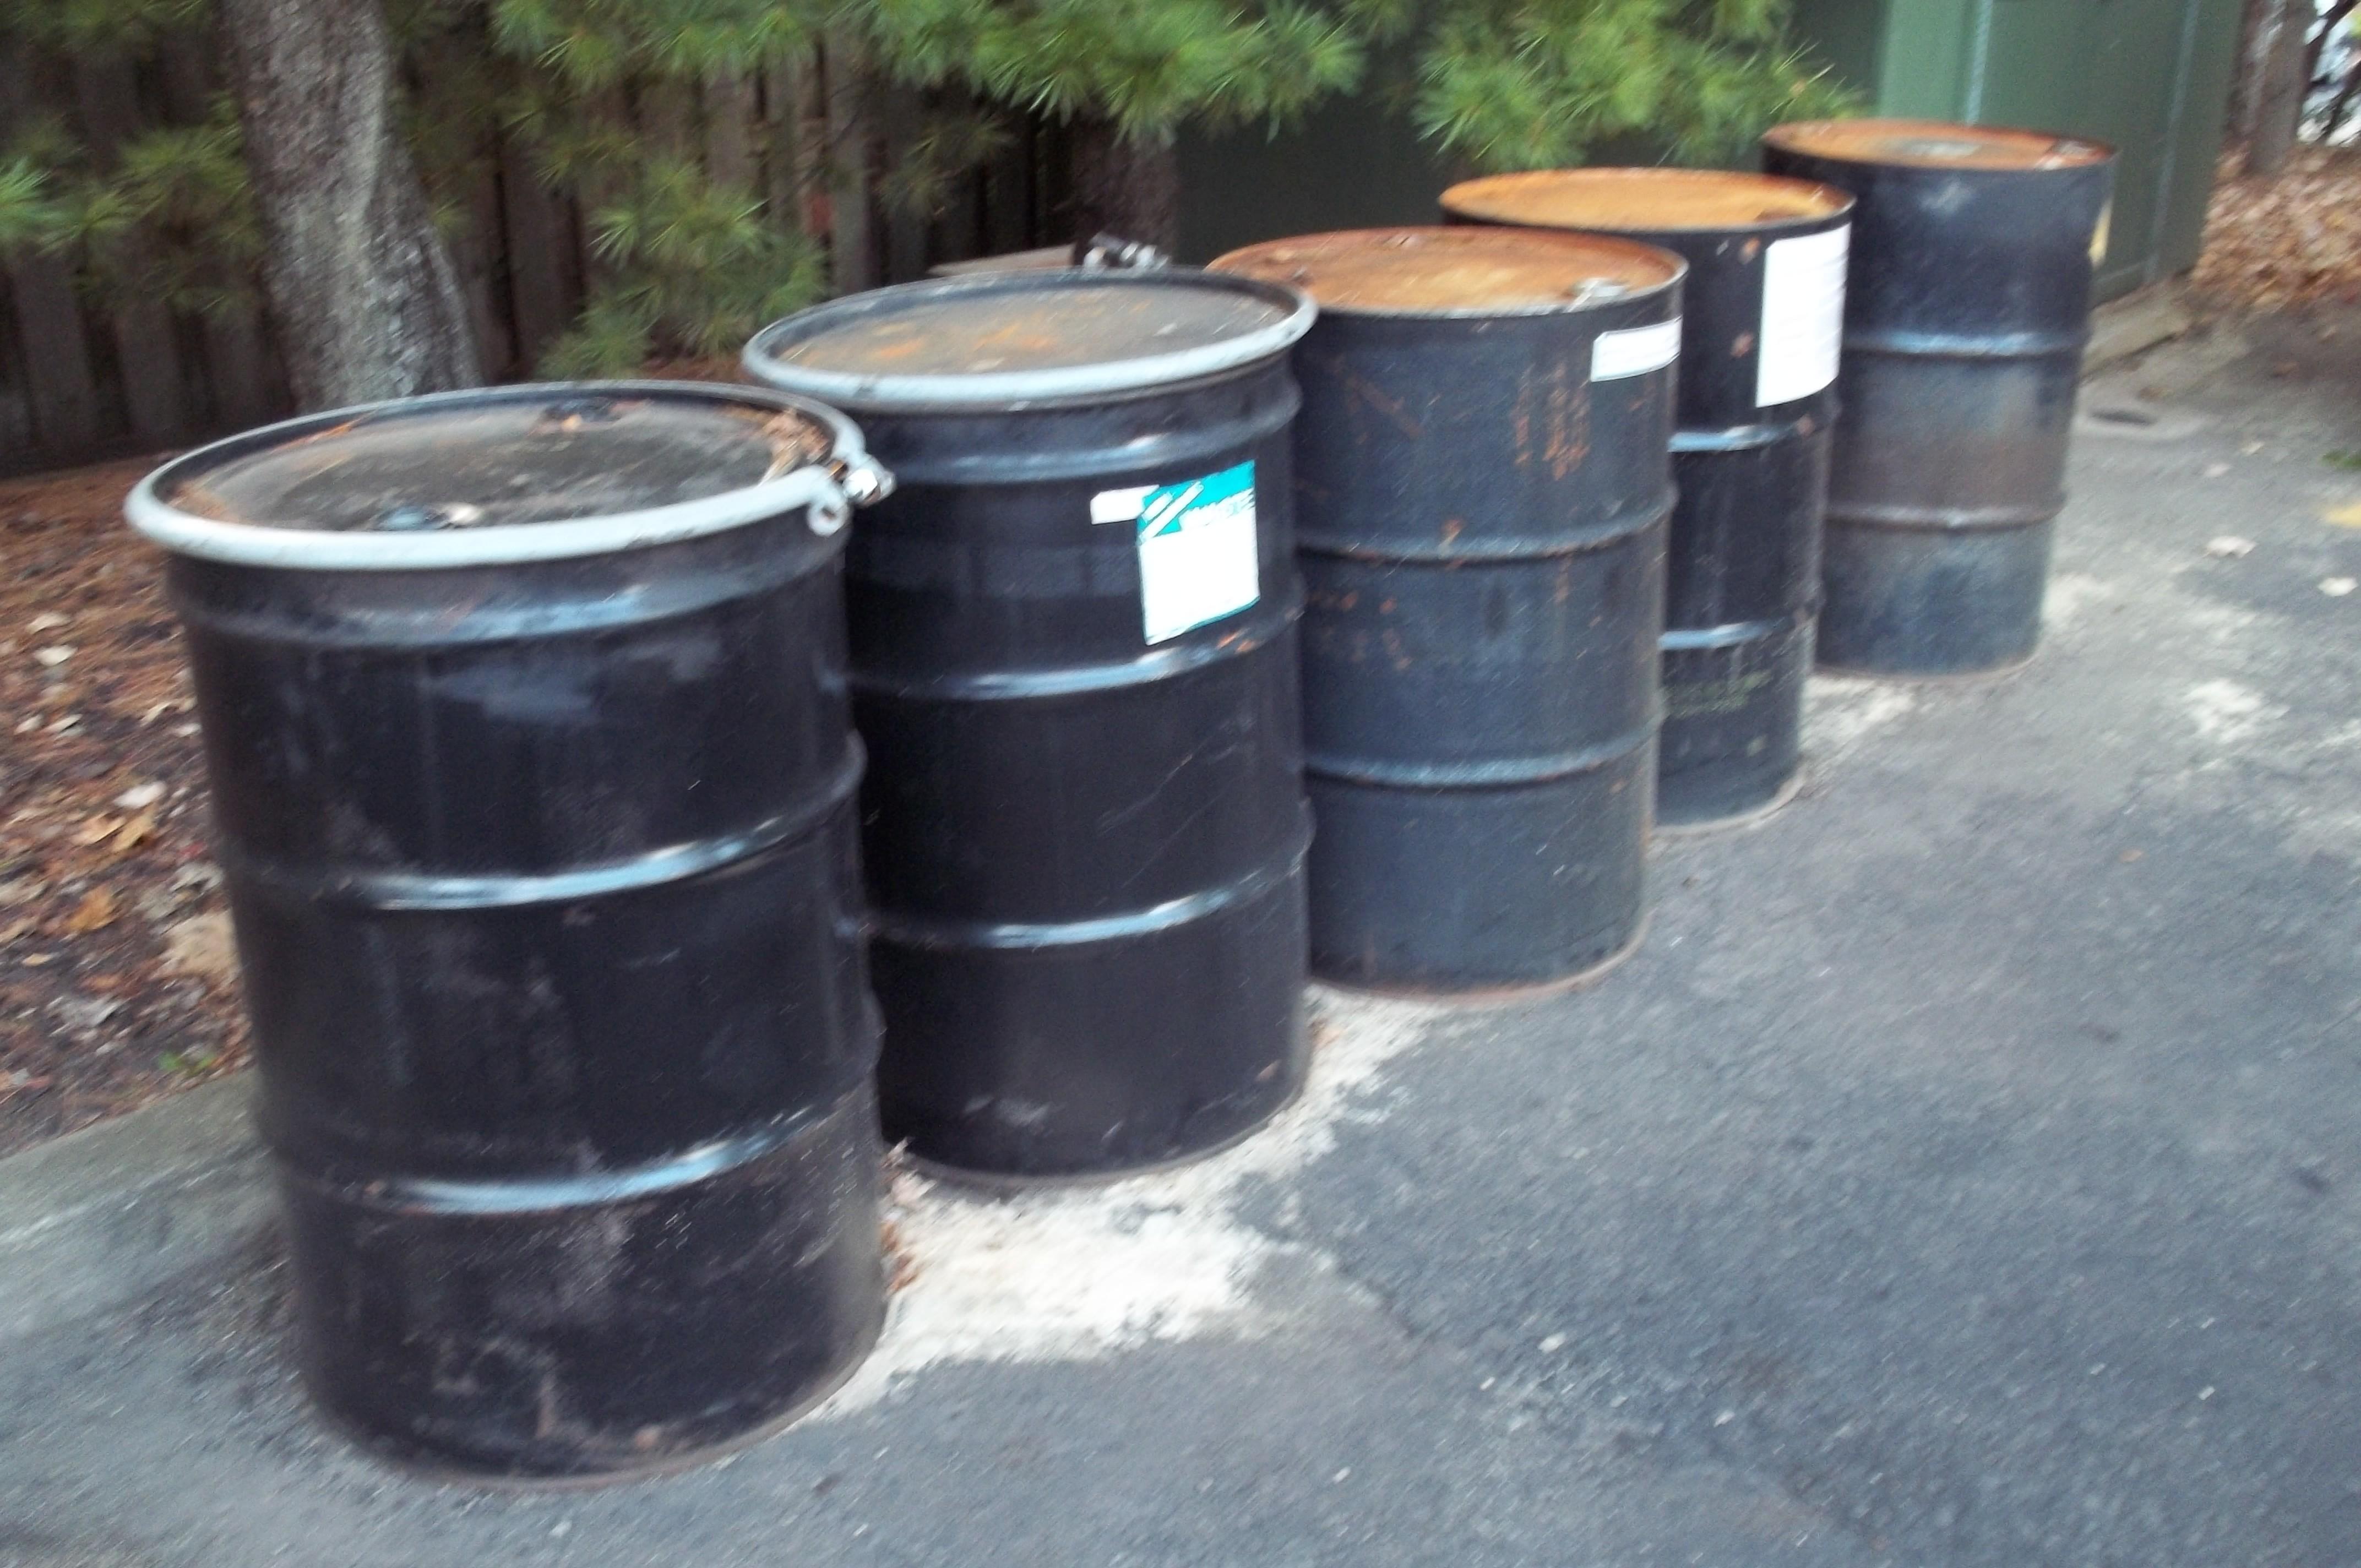 Common RCRA Violations From the USEPA